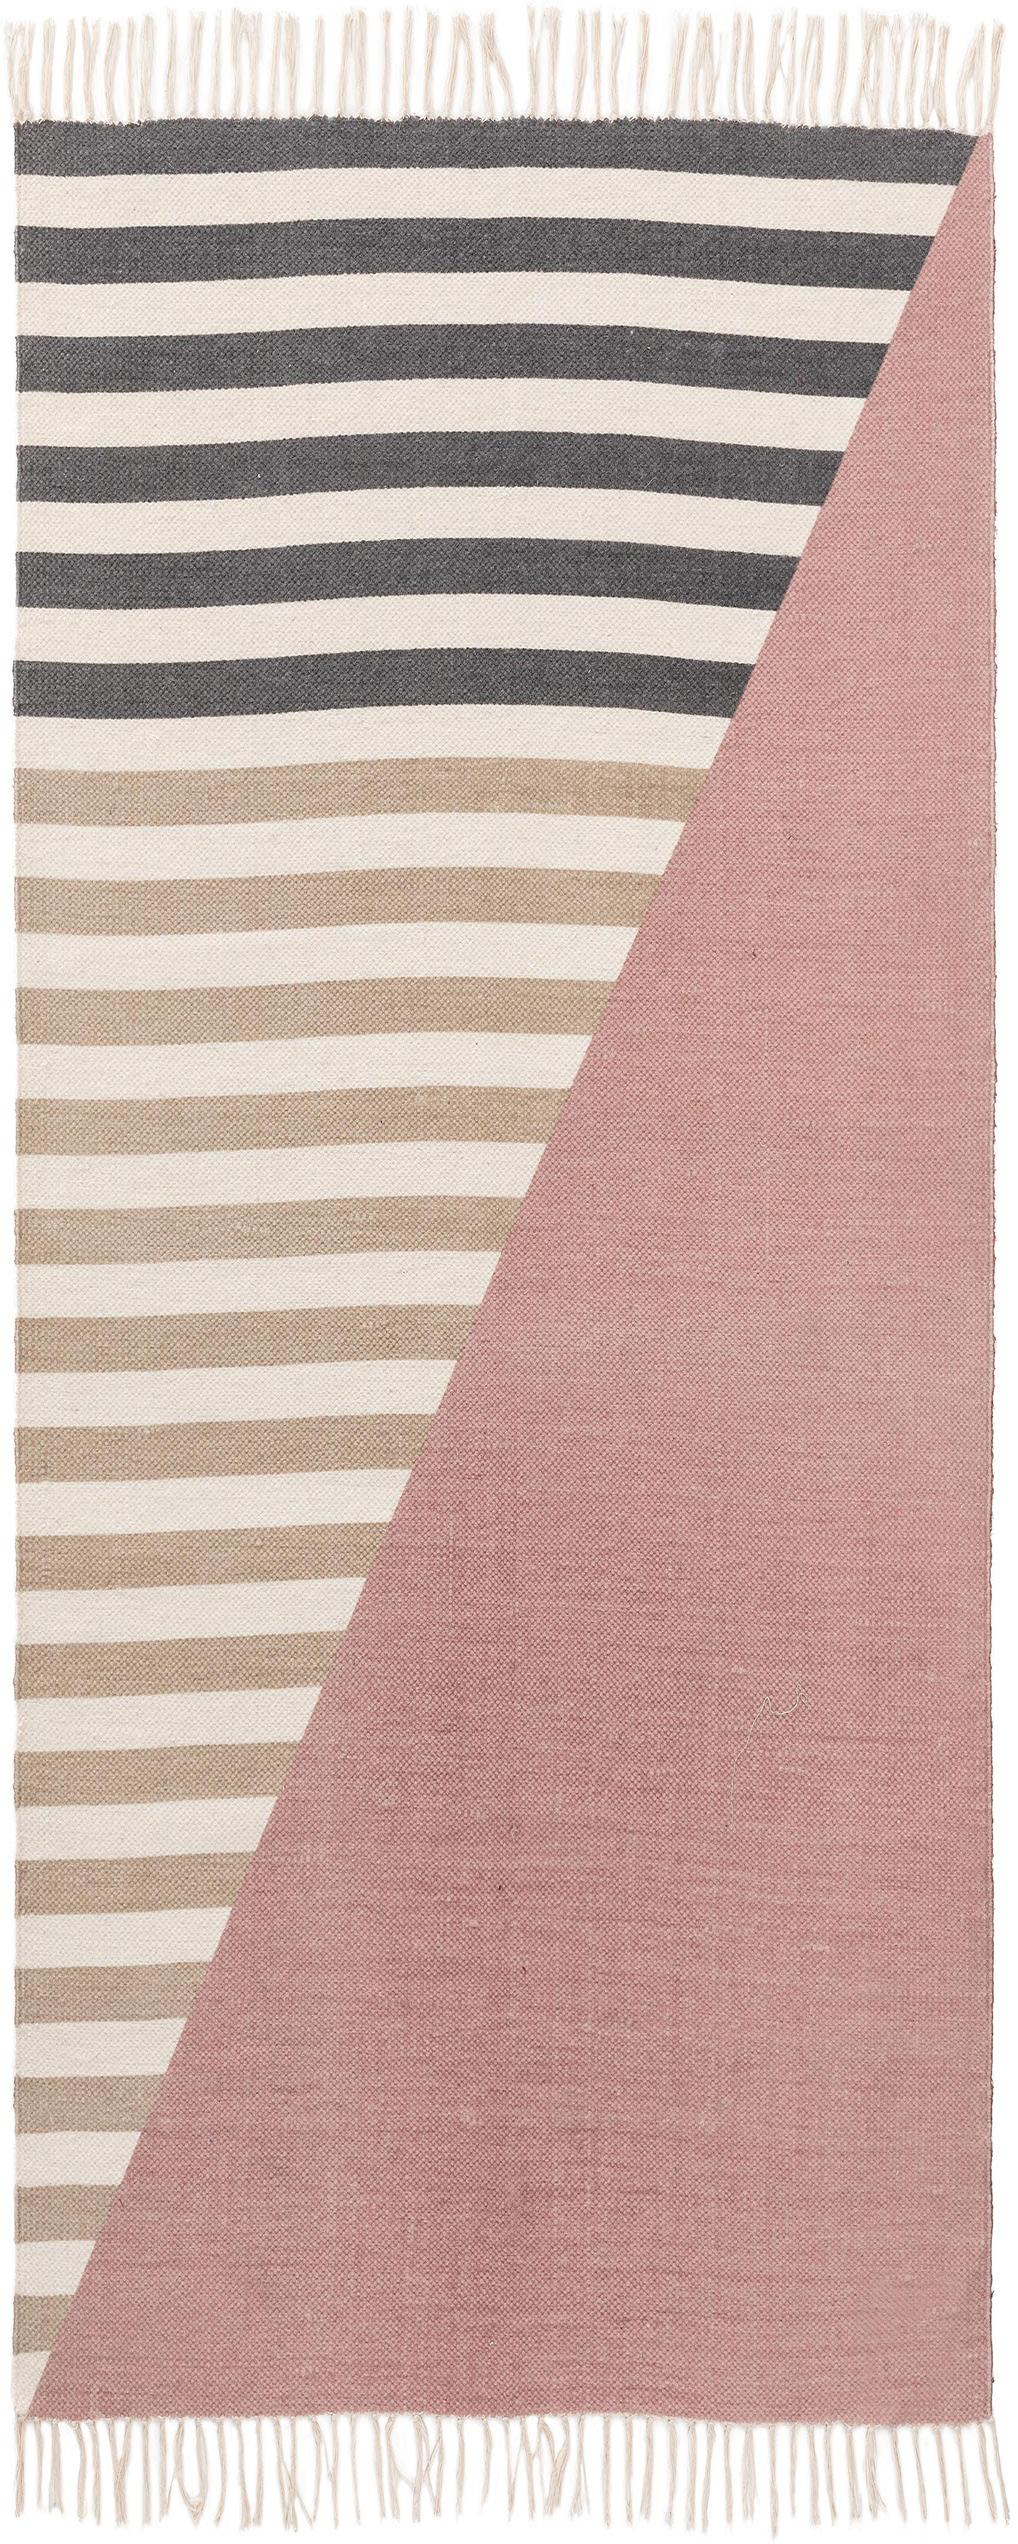 Tappeto di lana Oasis, 100% lana, Rosa, beige, taupe, Larg. 60 x Lung. 120 cm (taglia XS)